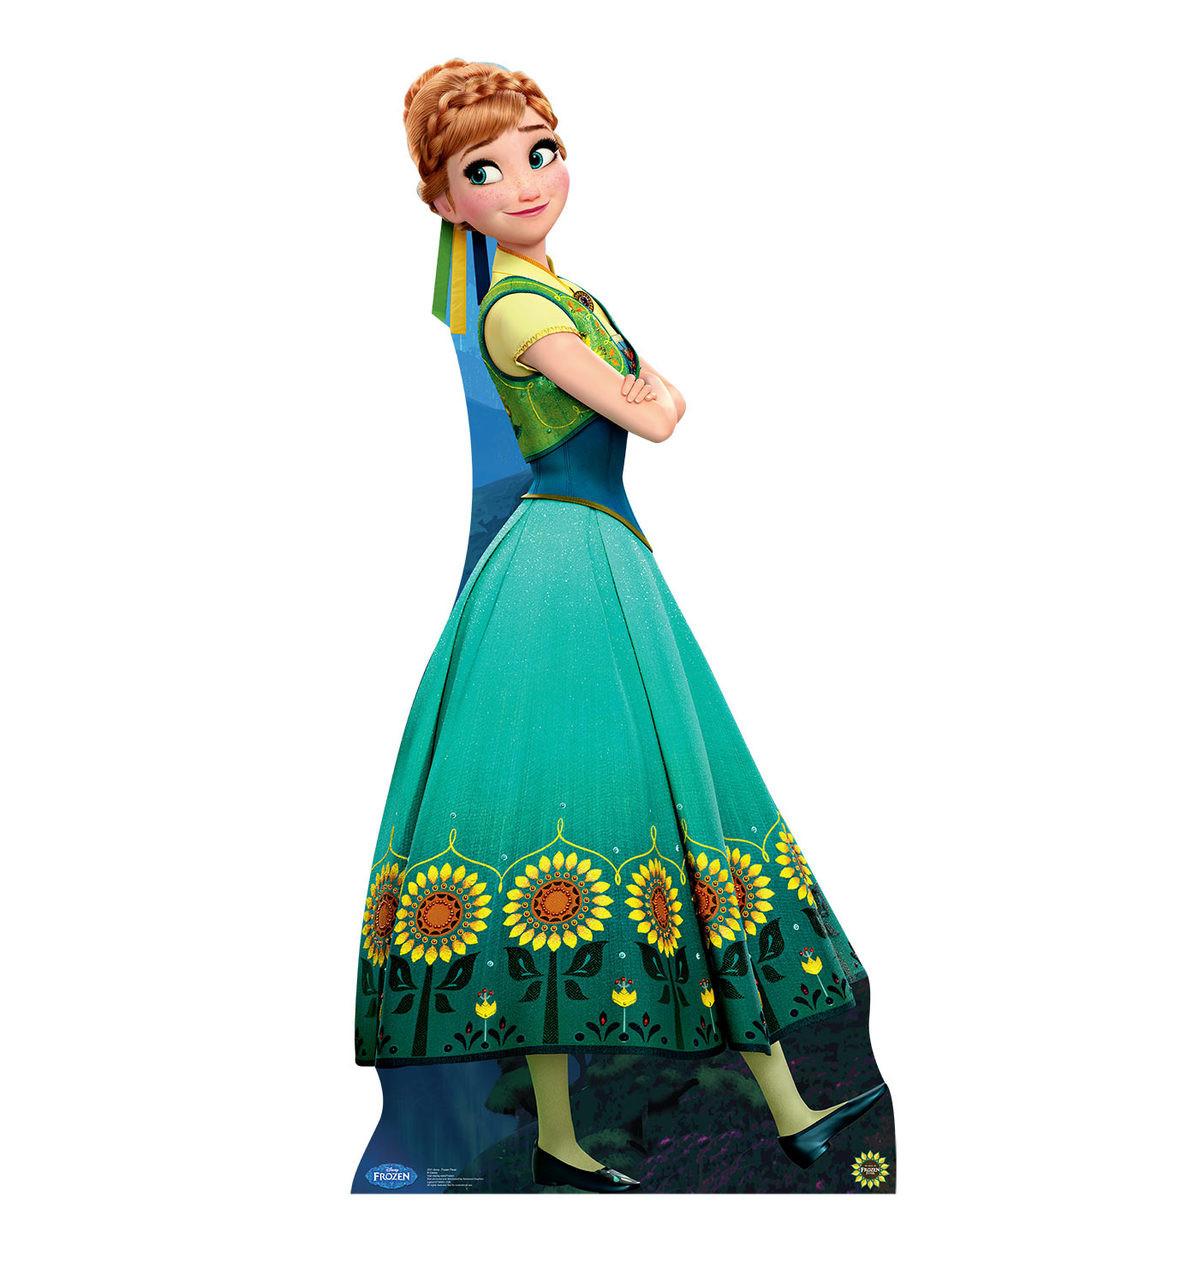 Anna - Frozen Fever - Cardboard Cutout Front View